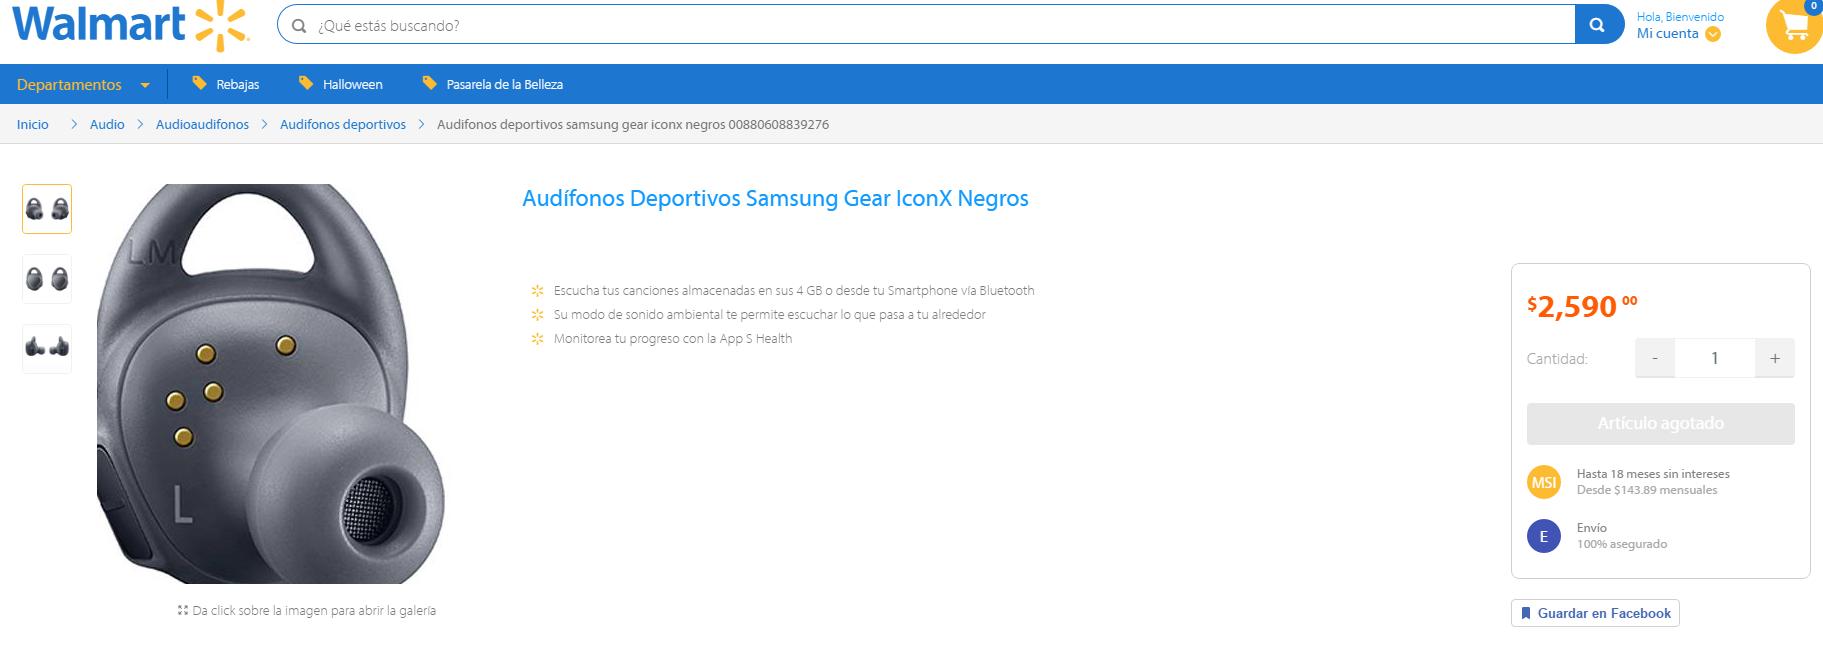 532887-QNpPQ.jpg